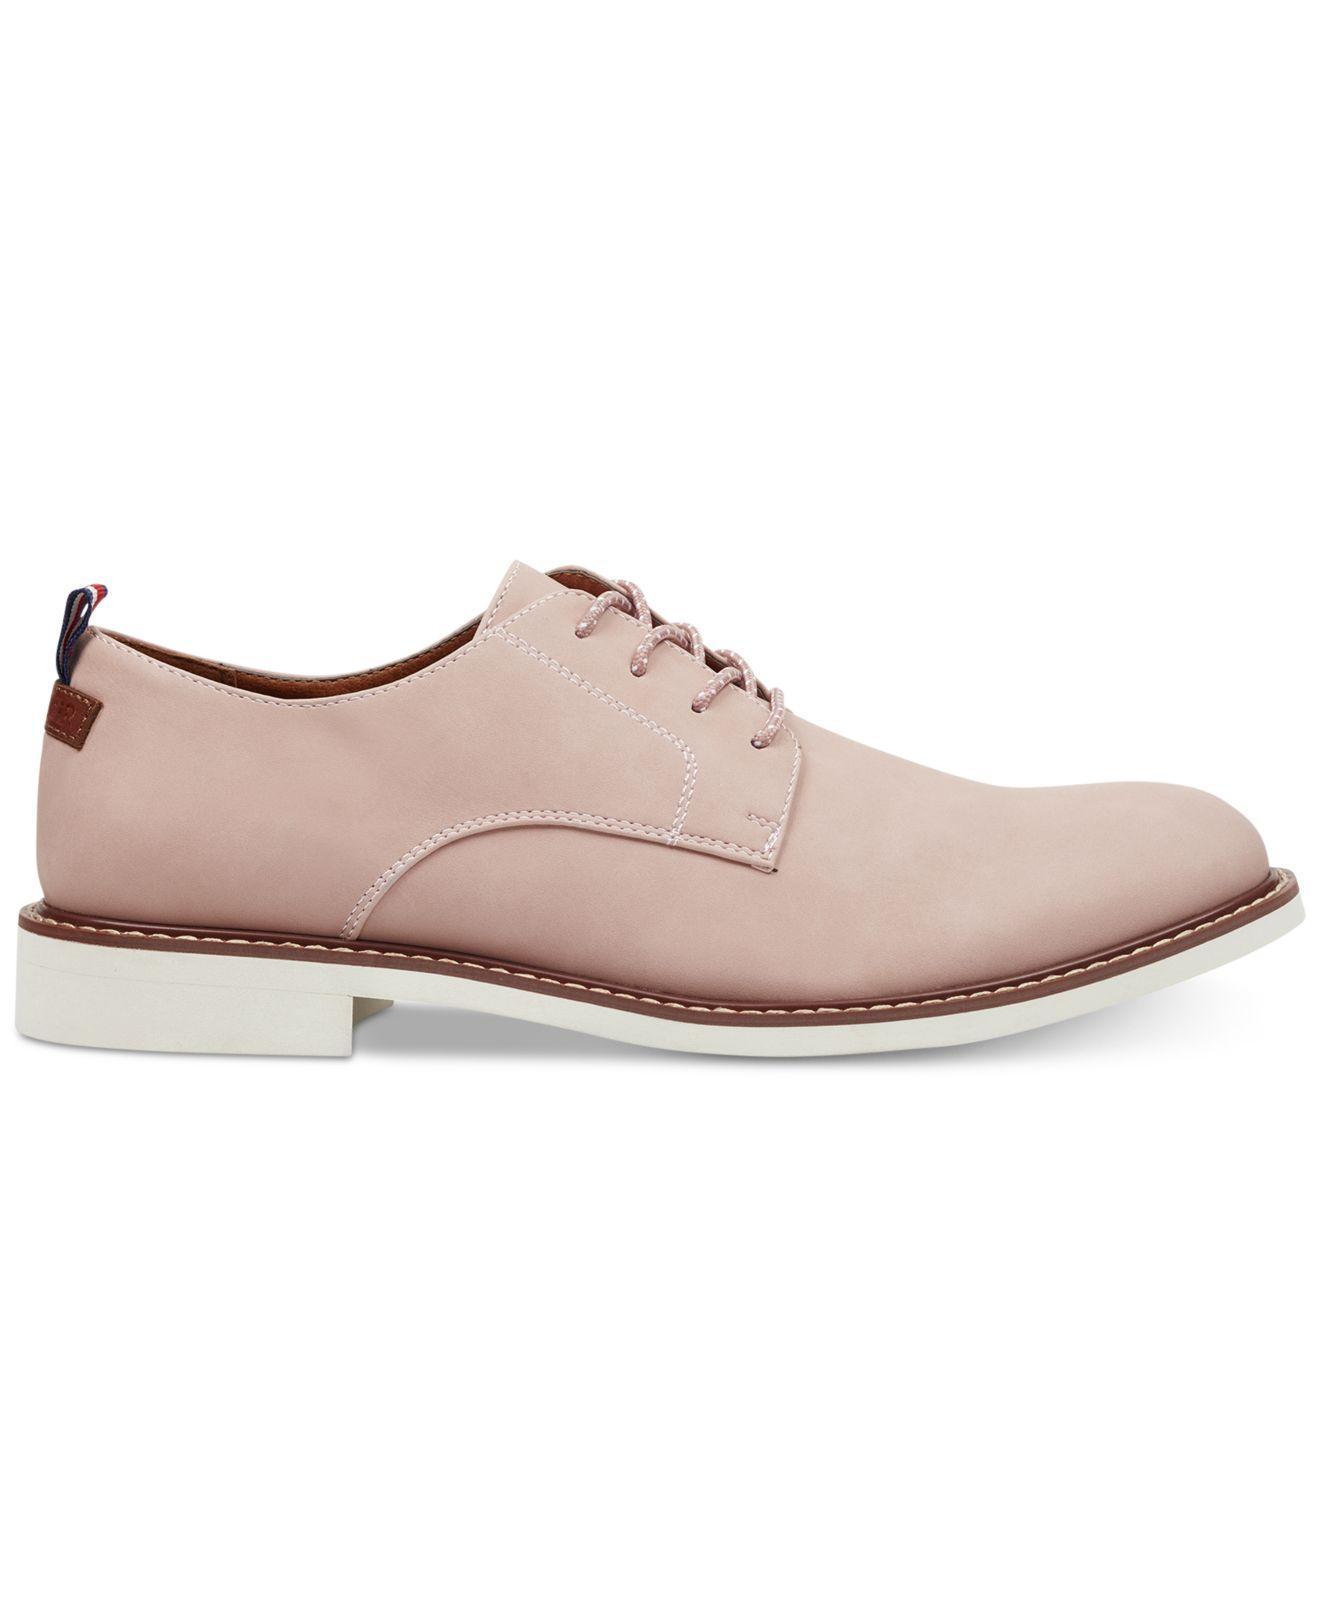 2755dc04c452bb Lyst - Tommy Hilfiger Garson Oxfords in Pink for Men - Save 31%